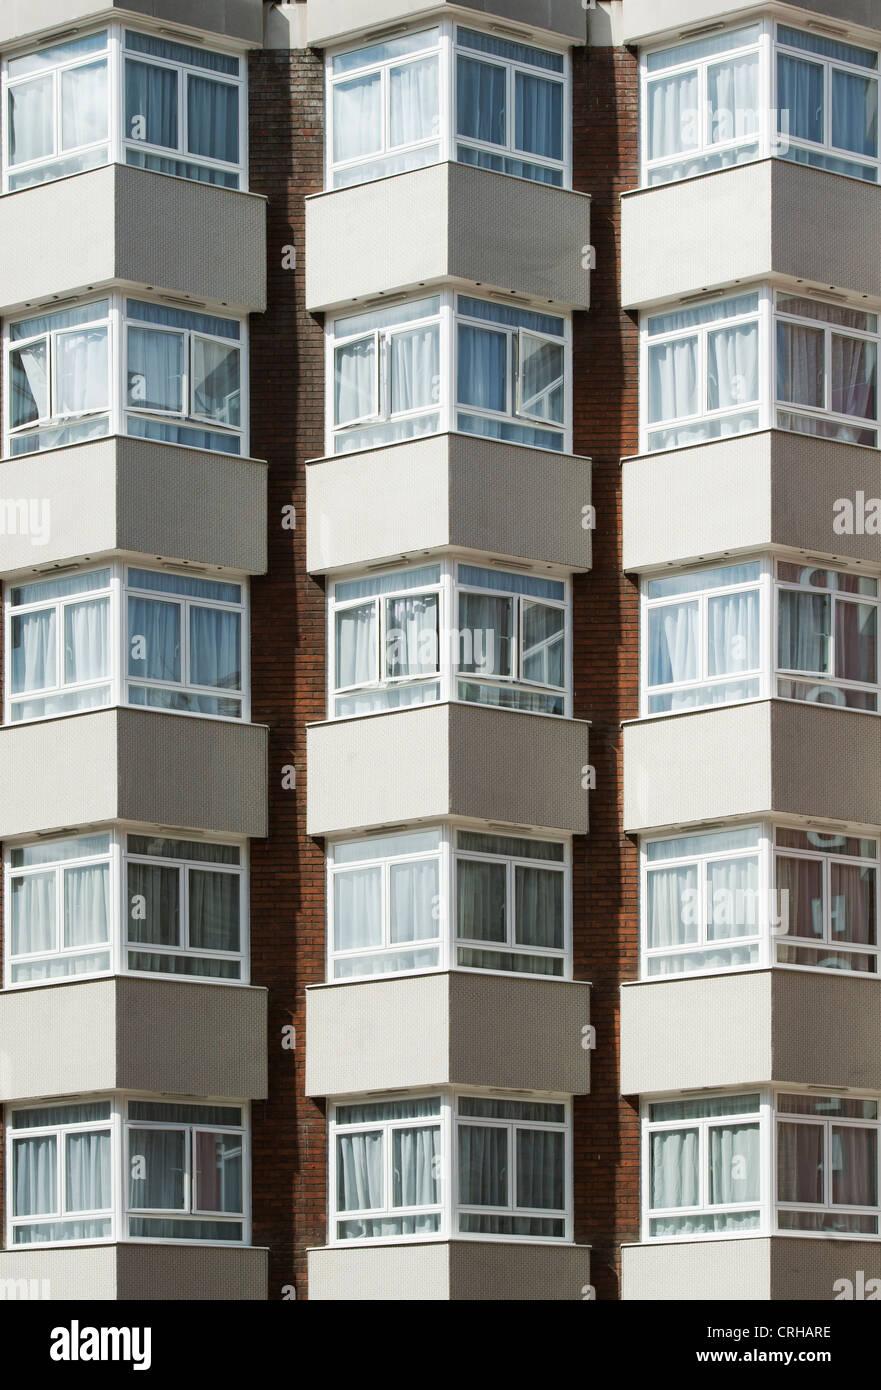 Corner bay windows on a London block of flats. - Stock Image